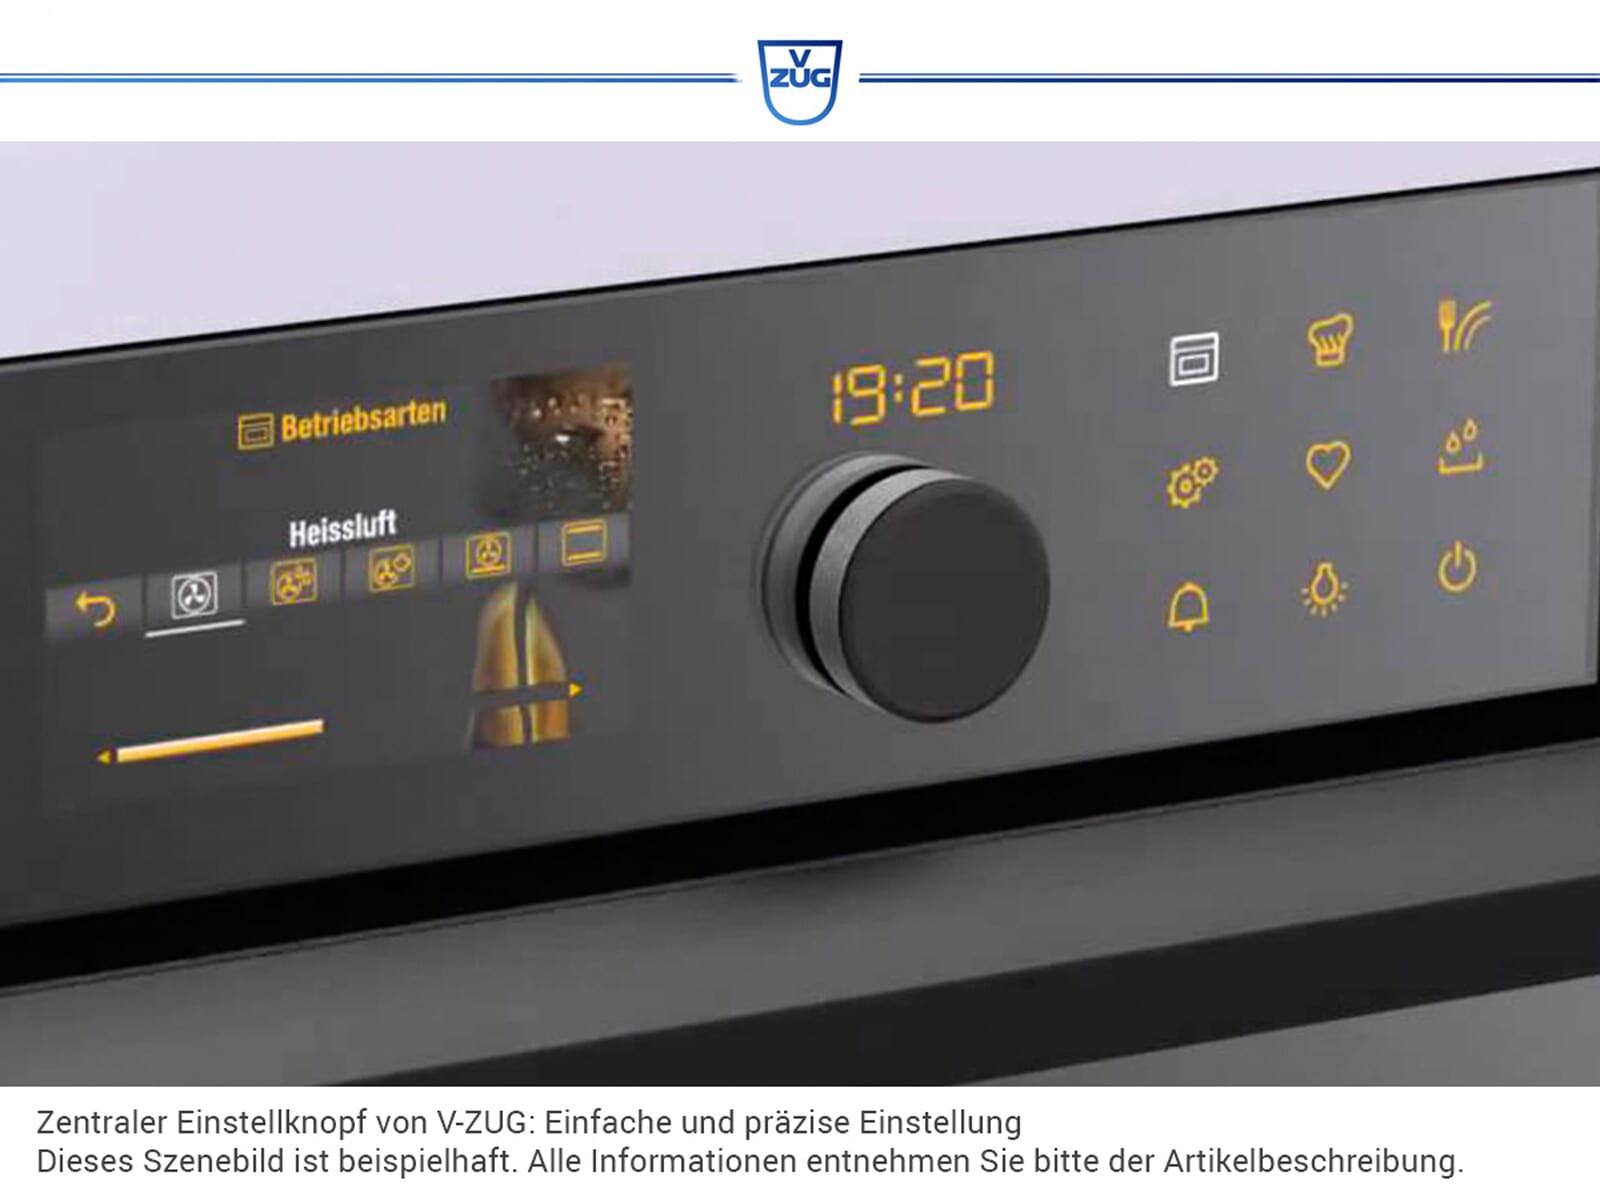 V-ZUG MWHSLZ60c Miwell HSL 60 Einbau-Mikrowelle mit Grill ChromeClass